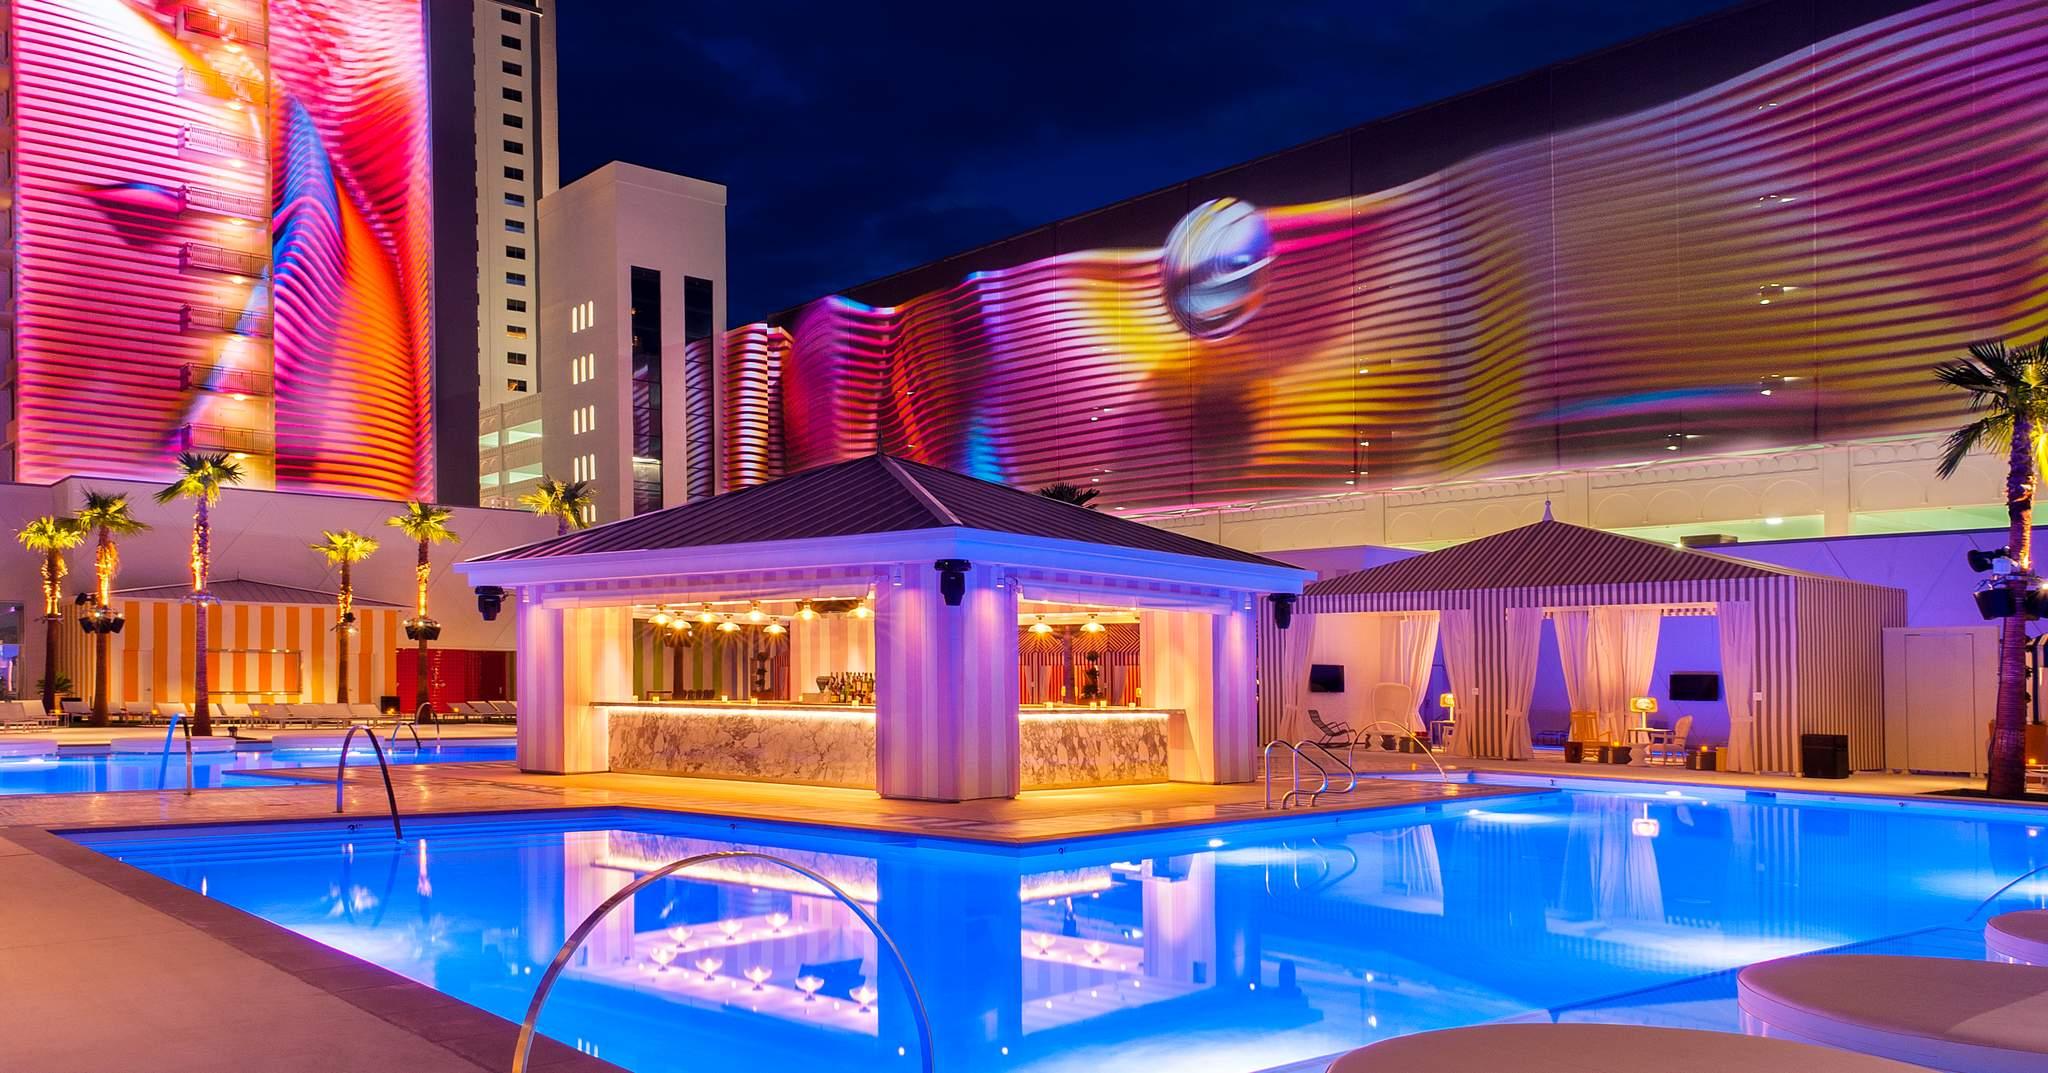 sls hotel & casino las vegas 4